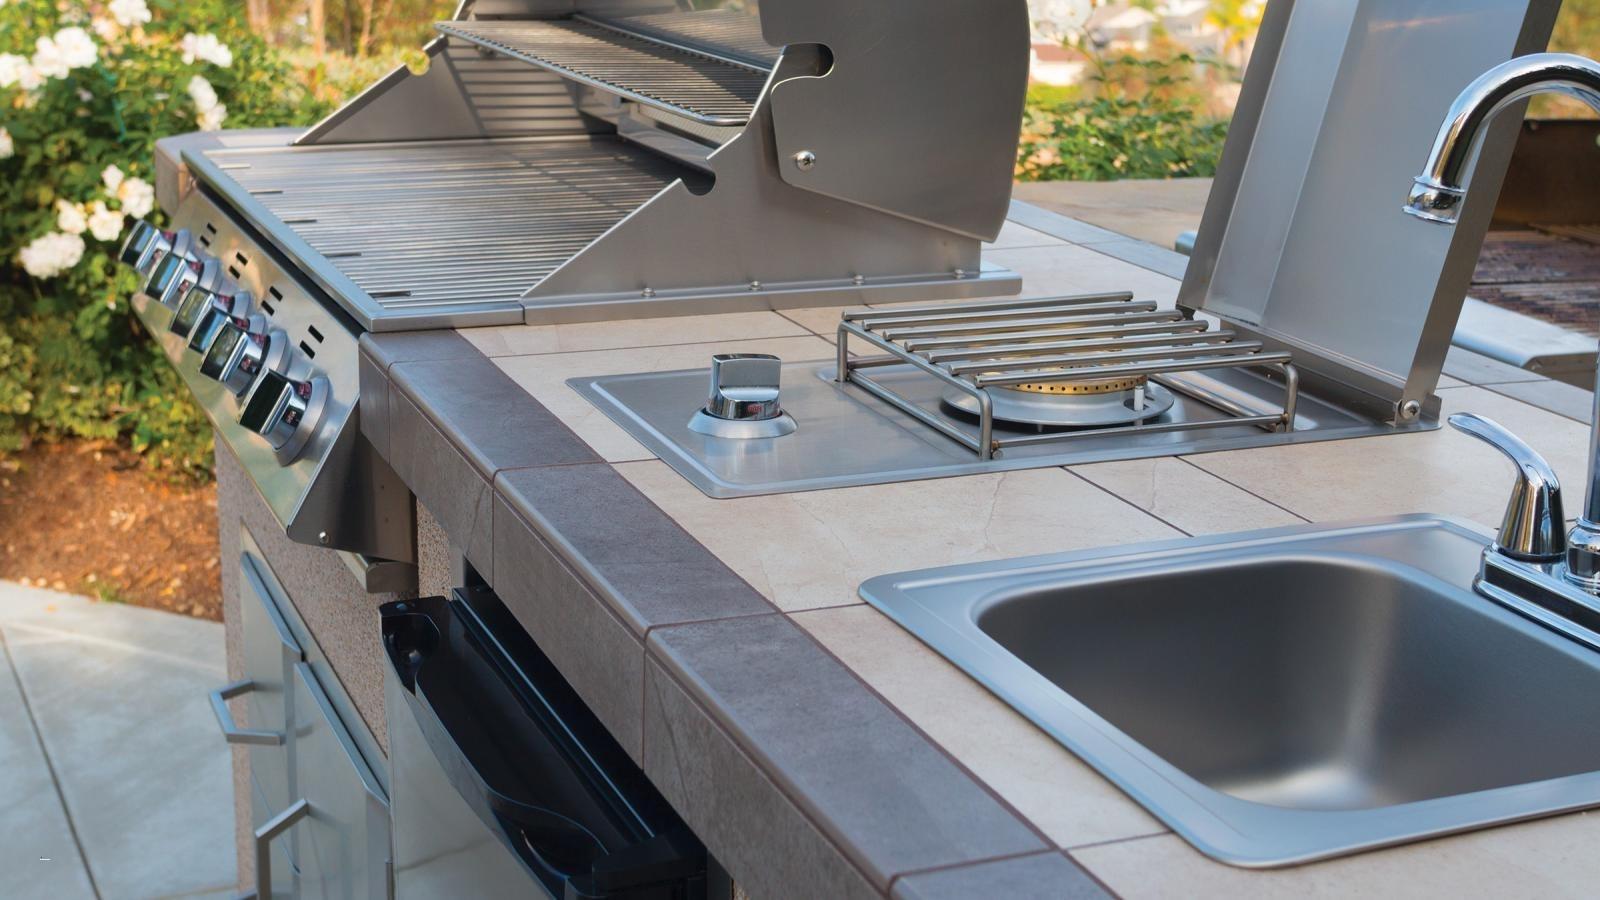 outdoor kitchen sink drain inspiration randolph indoor and outdoor rh randolphsunoco com